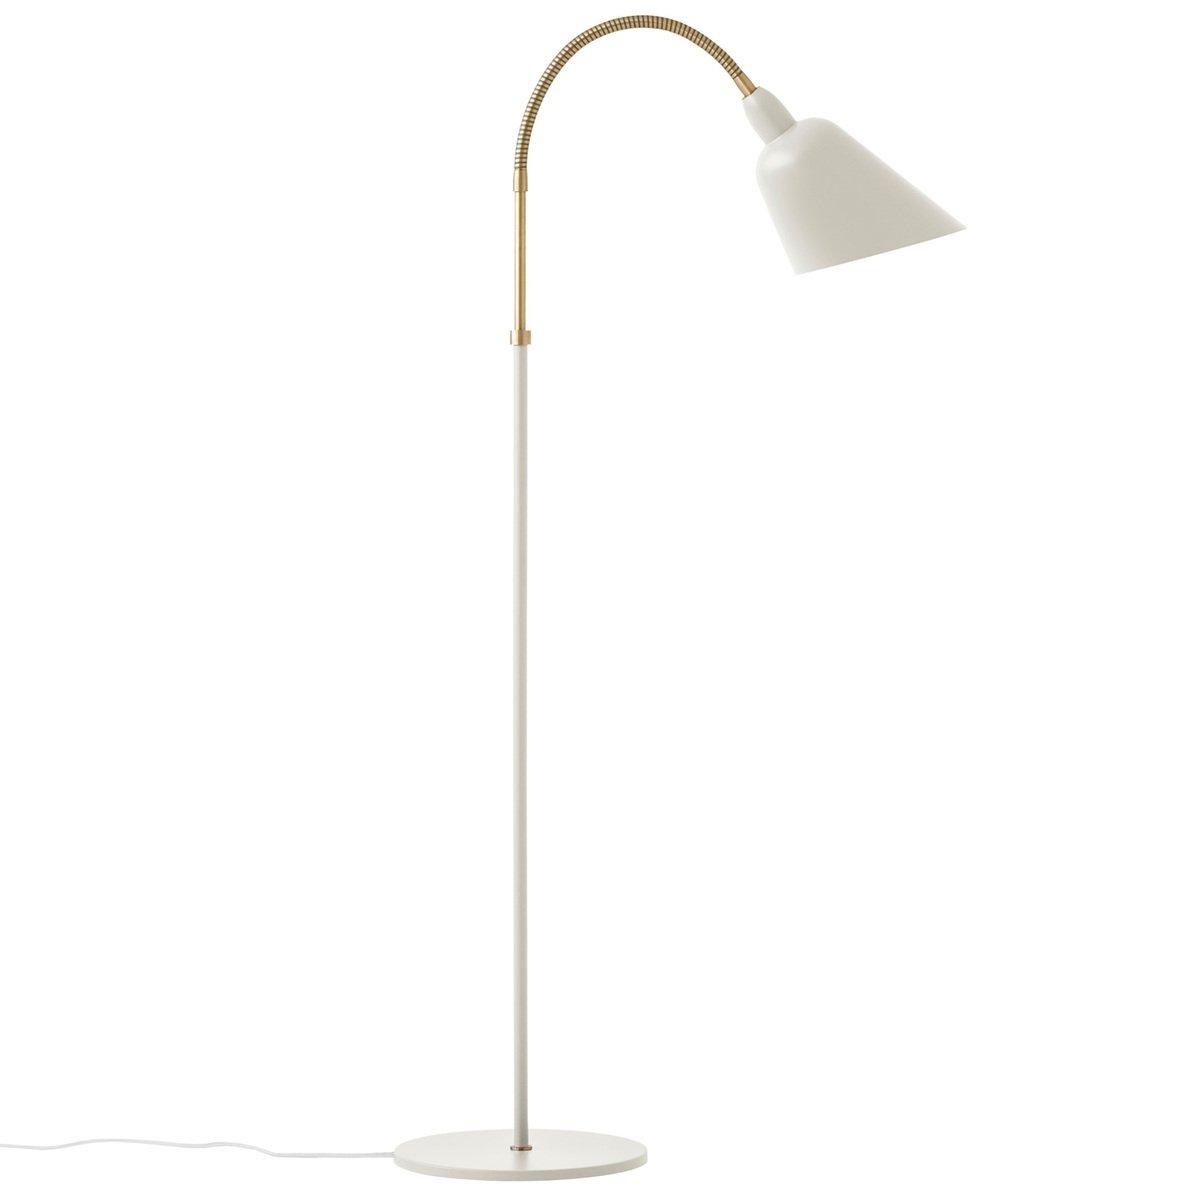 &Tradition Bellevue Aj7 Floor Lamp, White - Brass